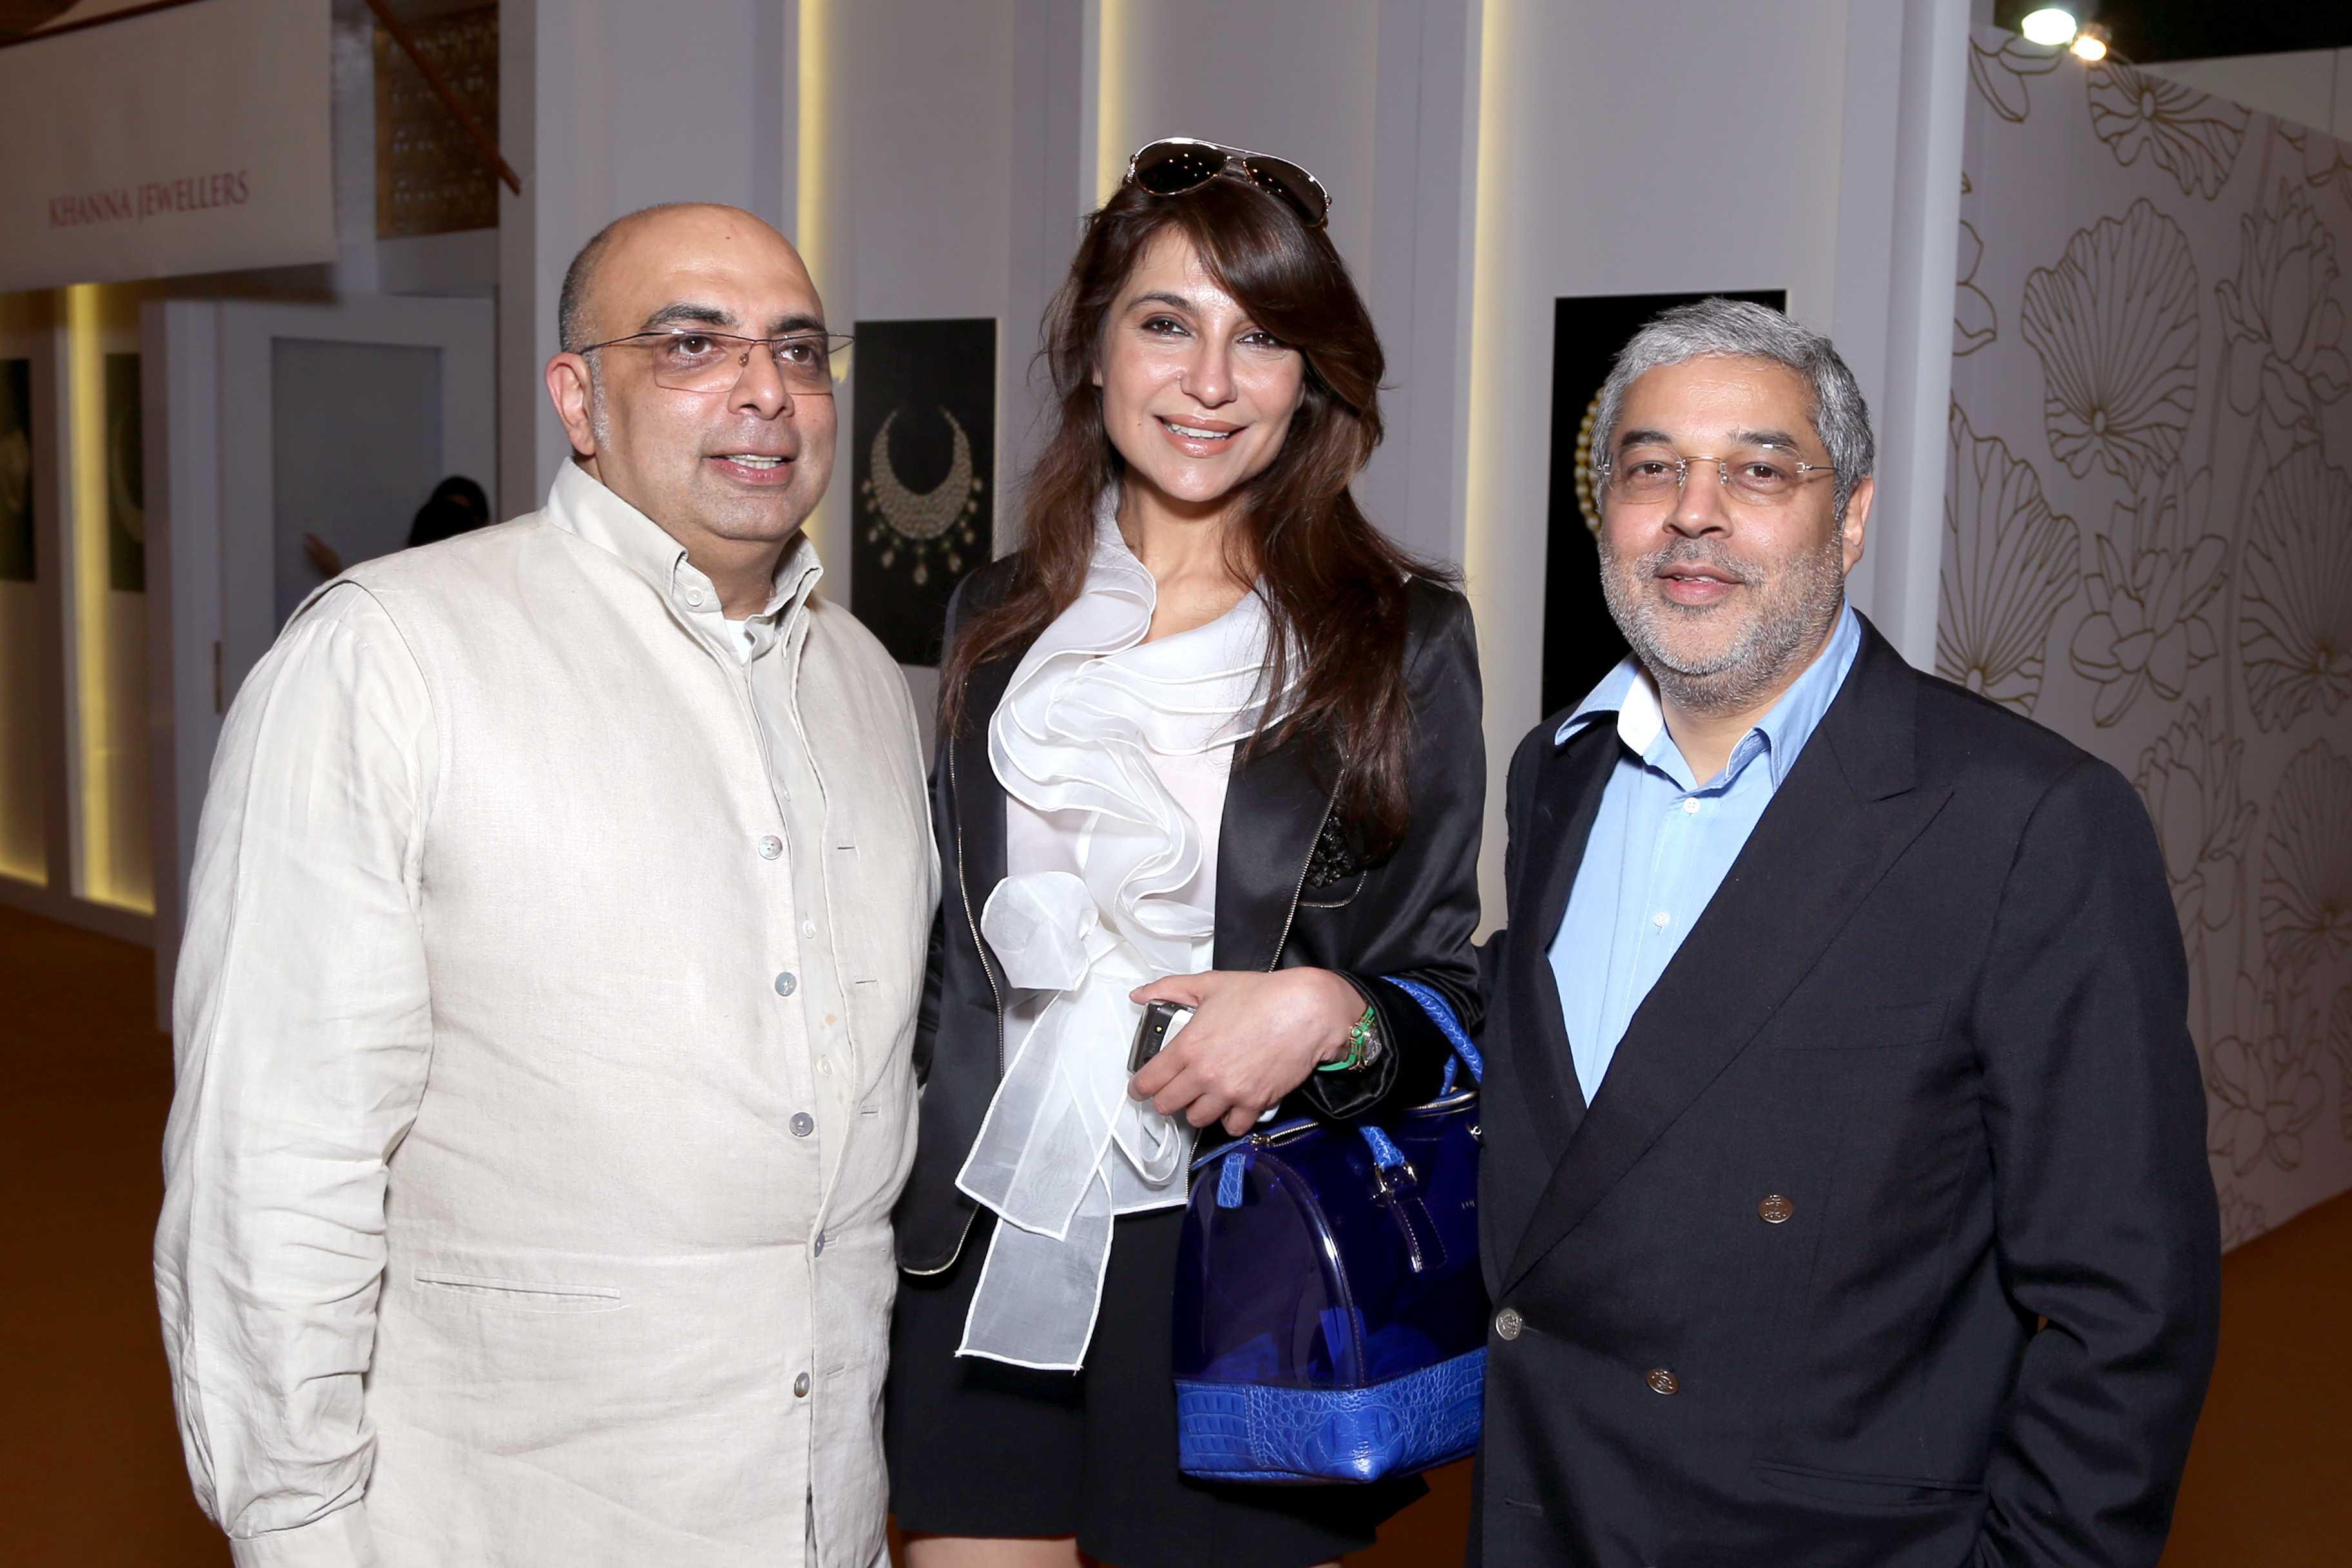 Tarun Tahiliani, Tanisha Mohan, Tikka Shatrujit Singh at the Vogue Wedding Show